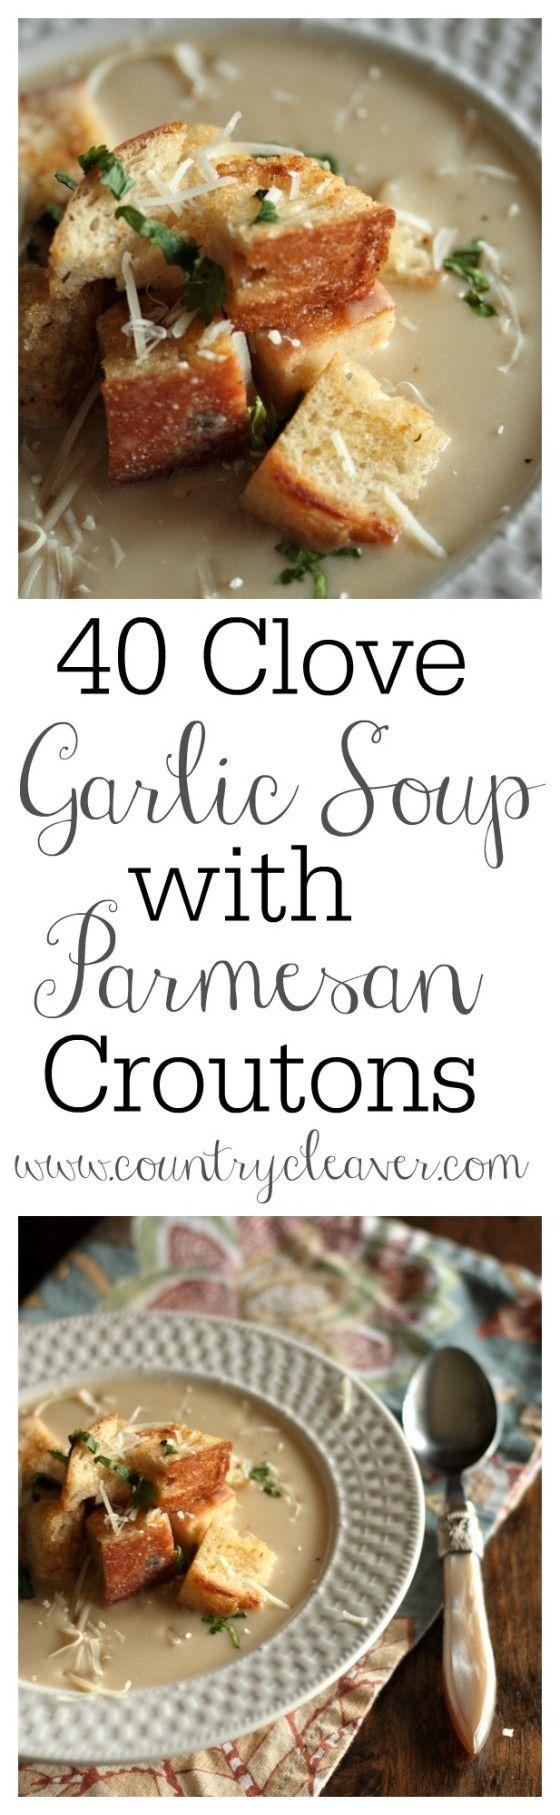 40 Clove Garlic Soup with Parmesan Croutons